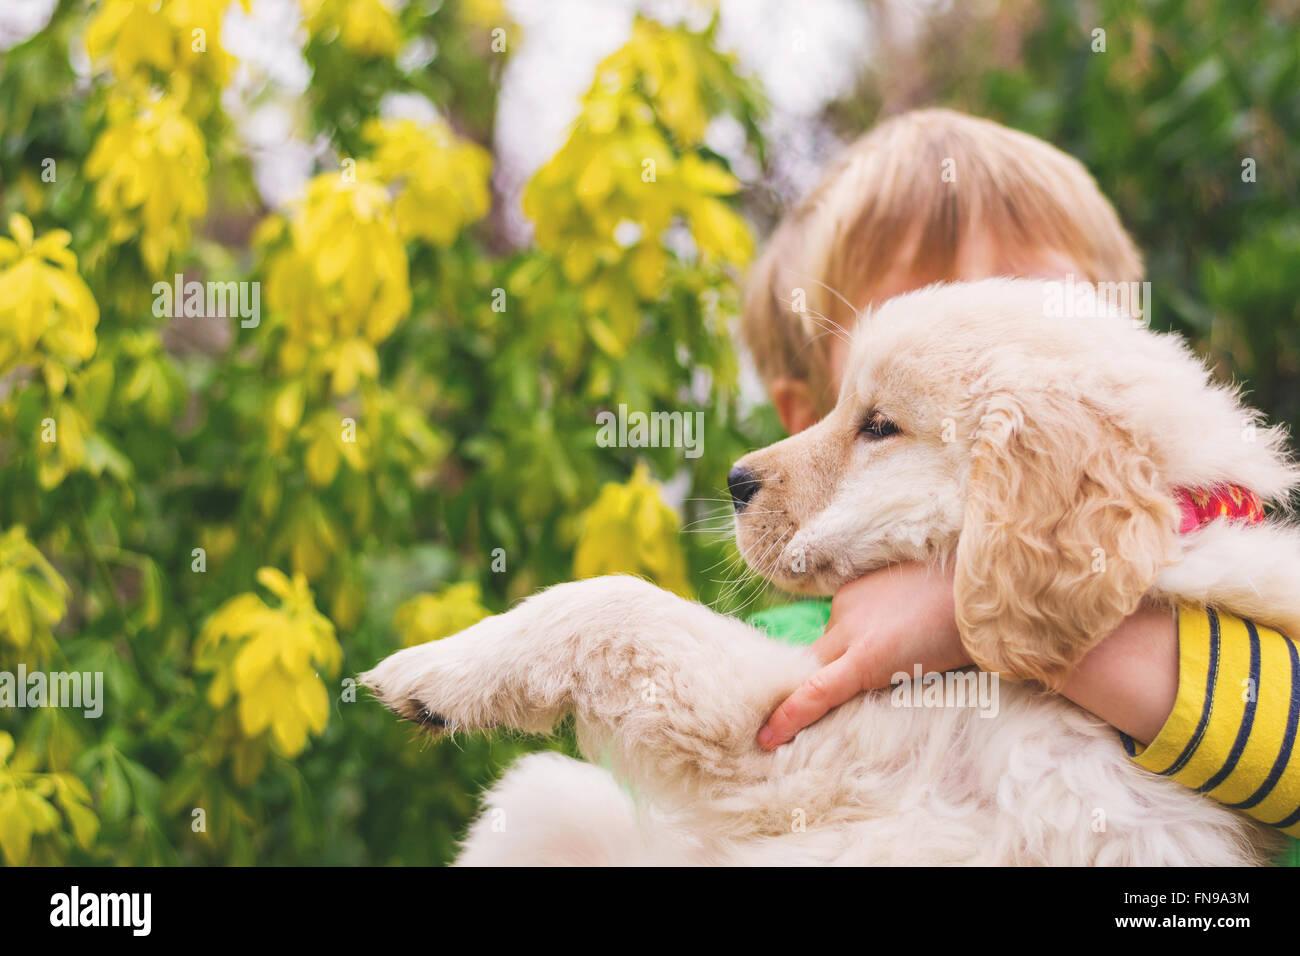 Boy hugging his golden retriever puppy dog - Stock Image